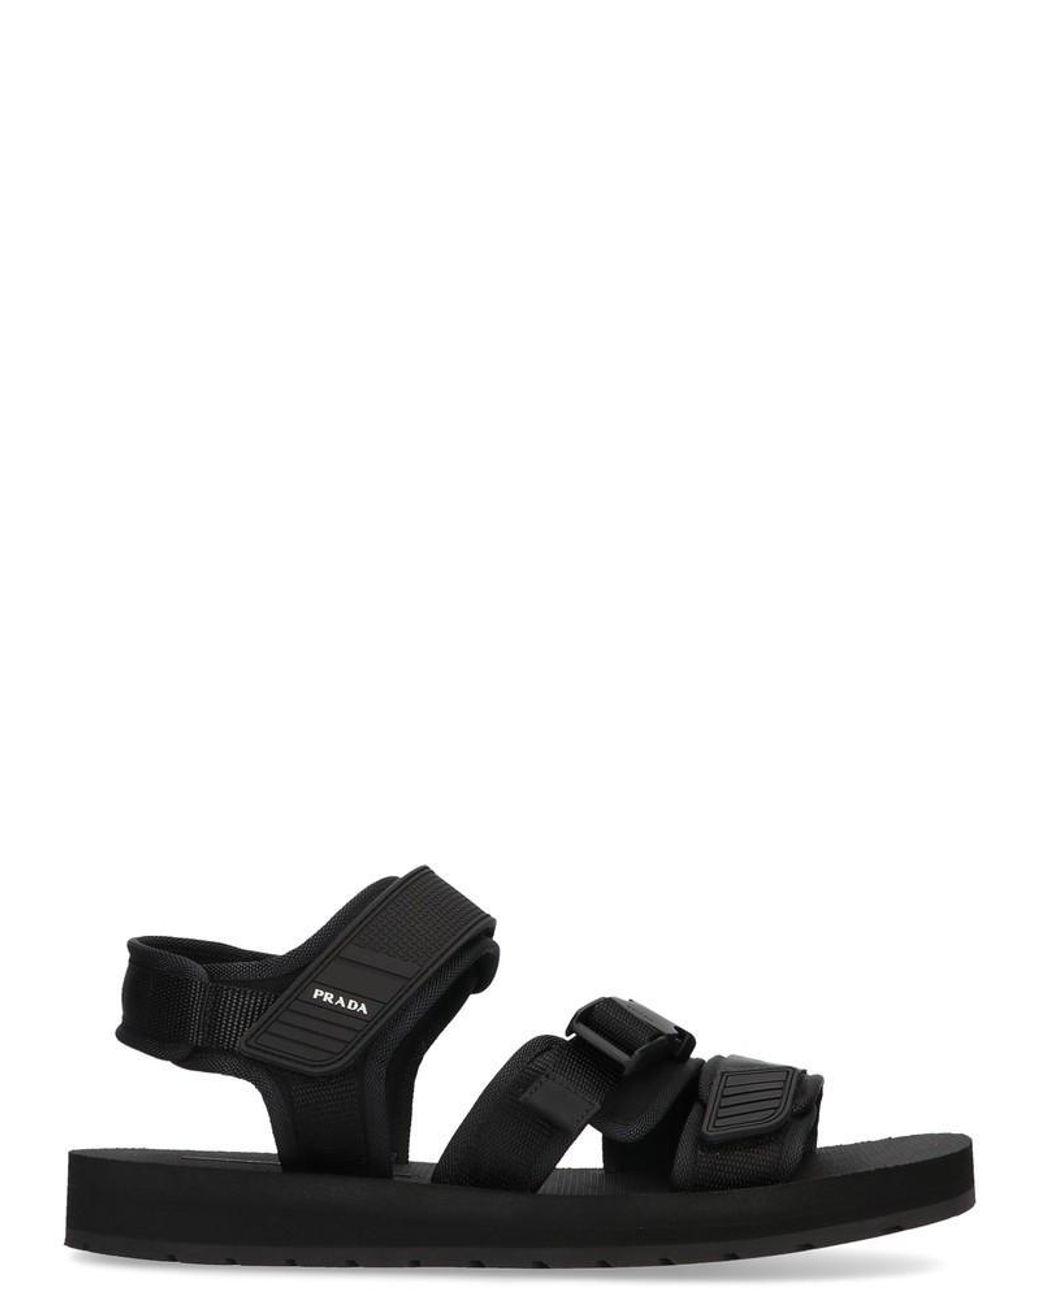 0072f78e967d Lyst - Prada Black Tech Sandals in Black for Men - Save 32%